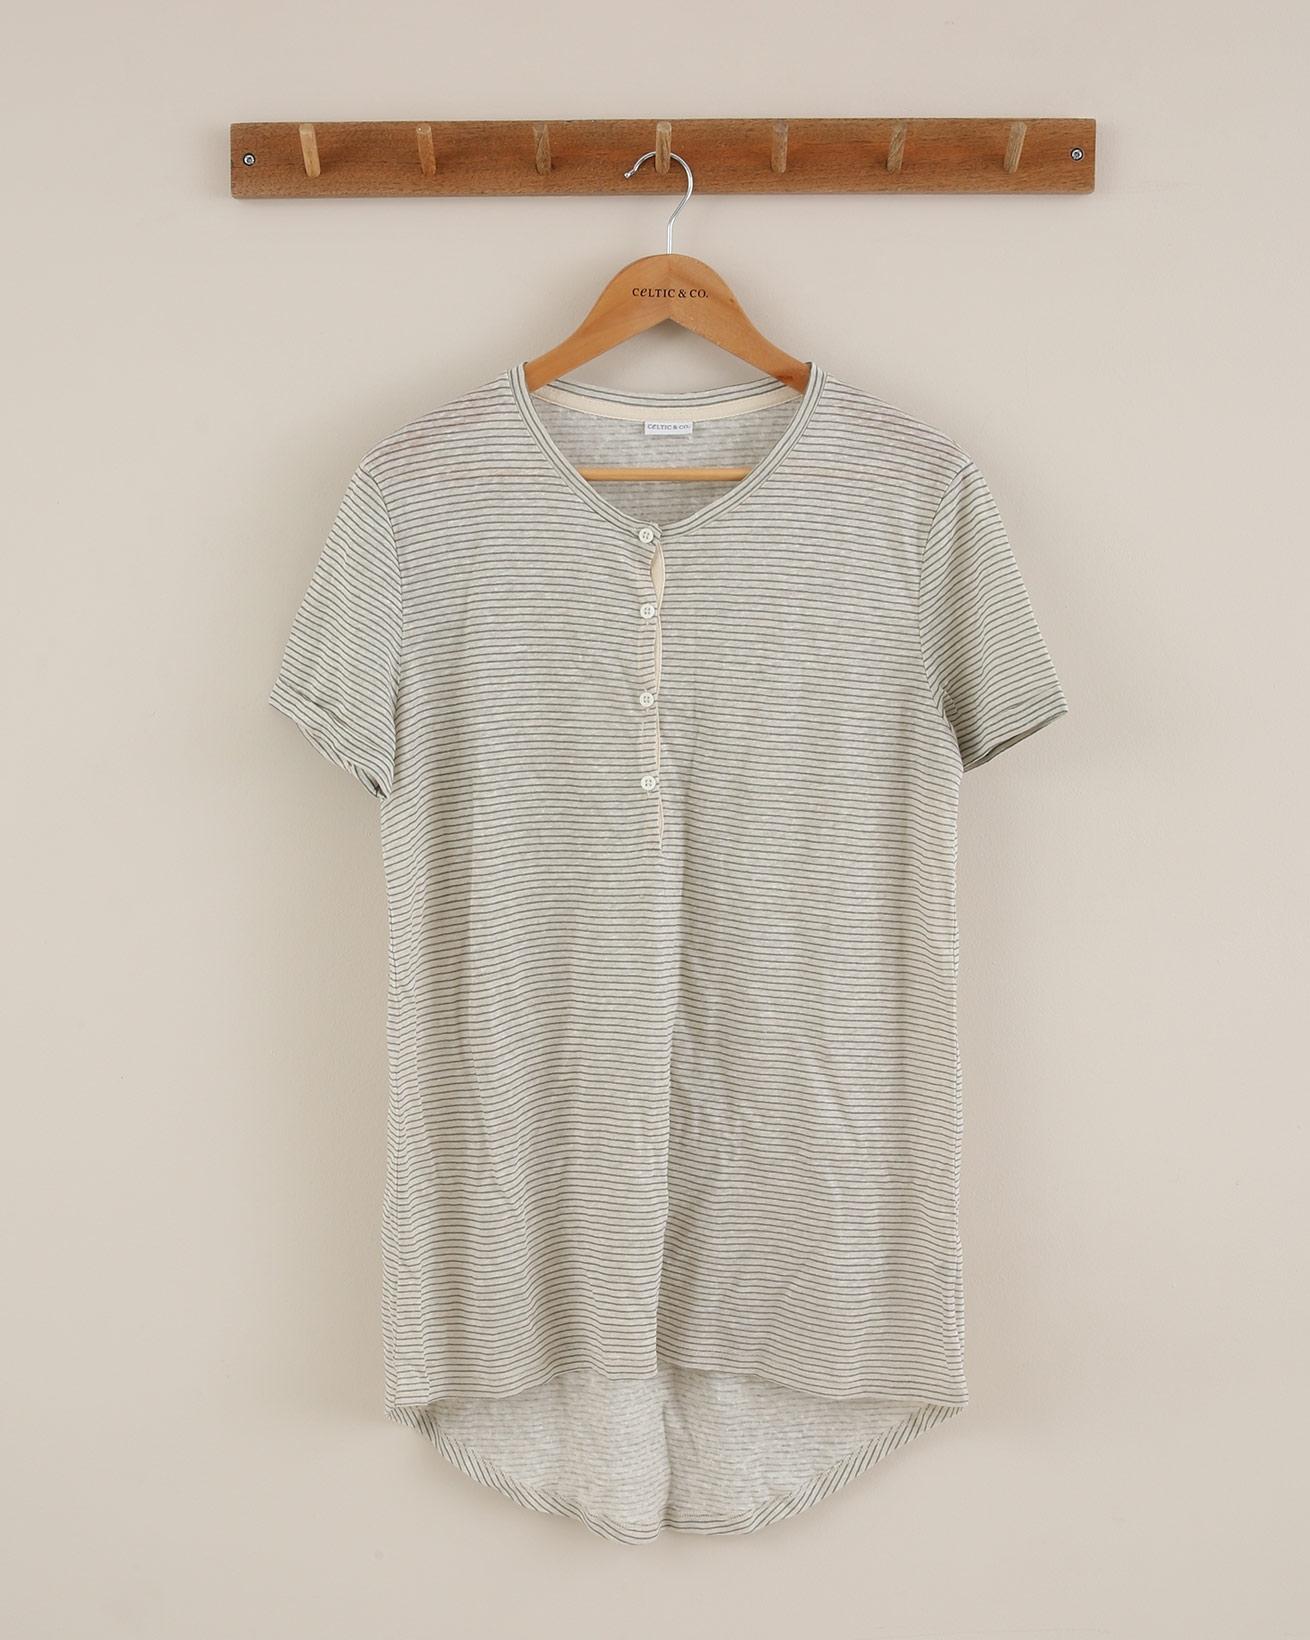 Linen Button Top - Size 14 - Sage Ecru - 1914